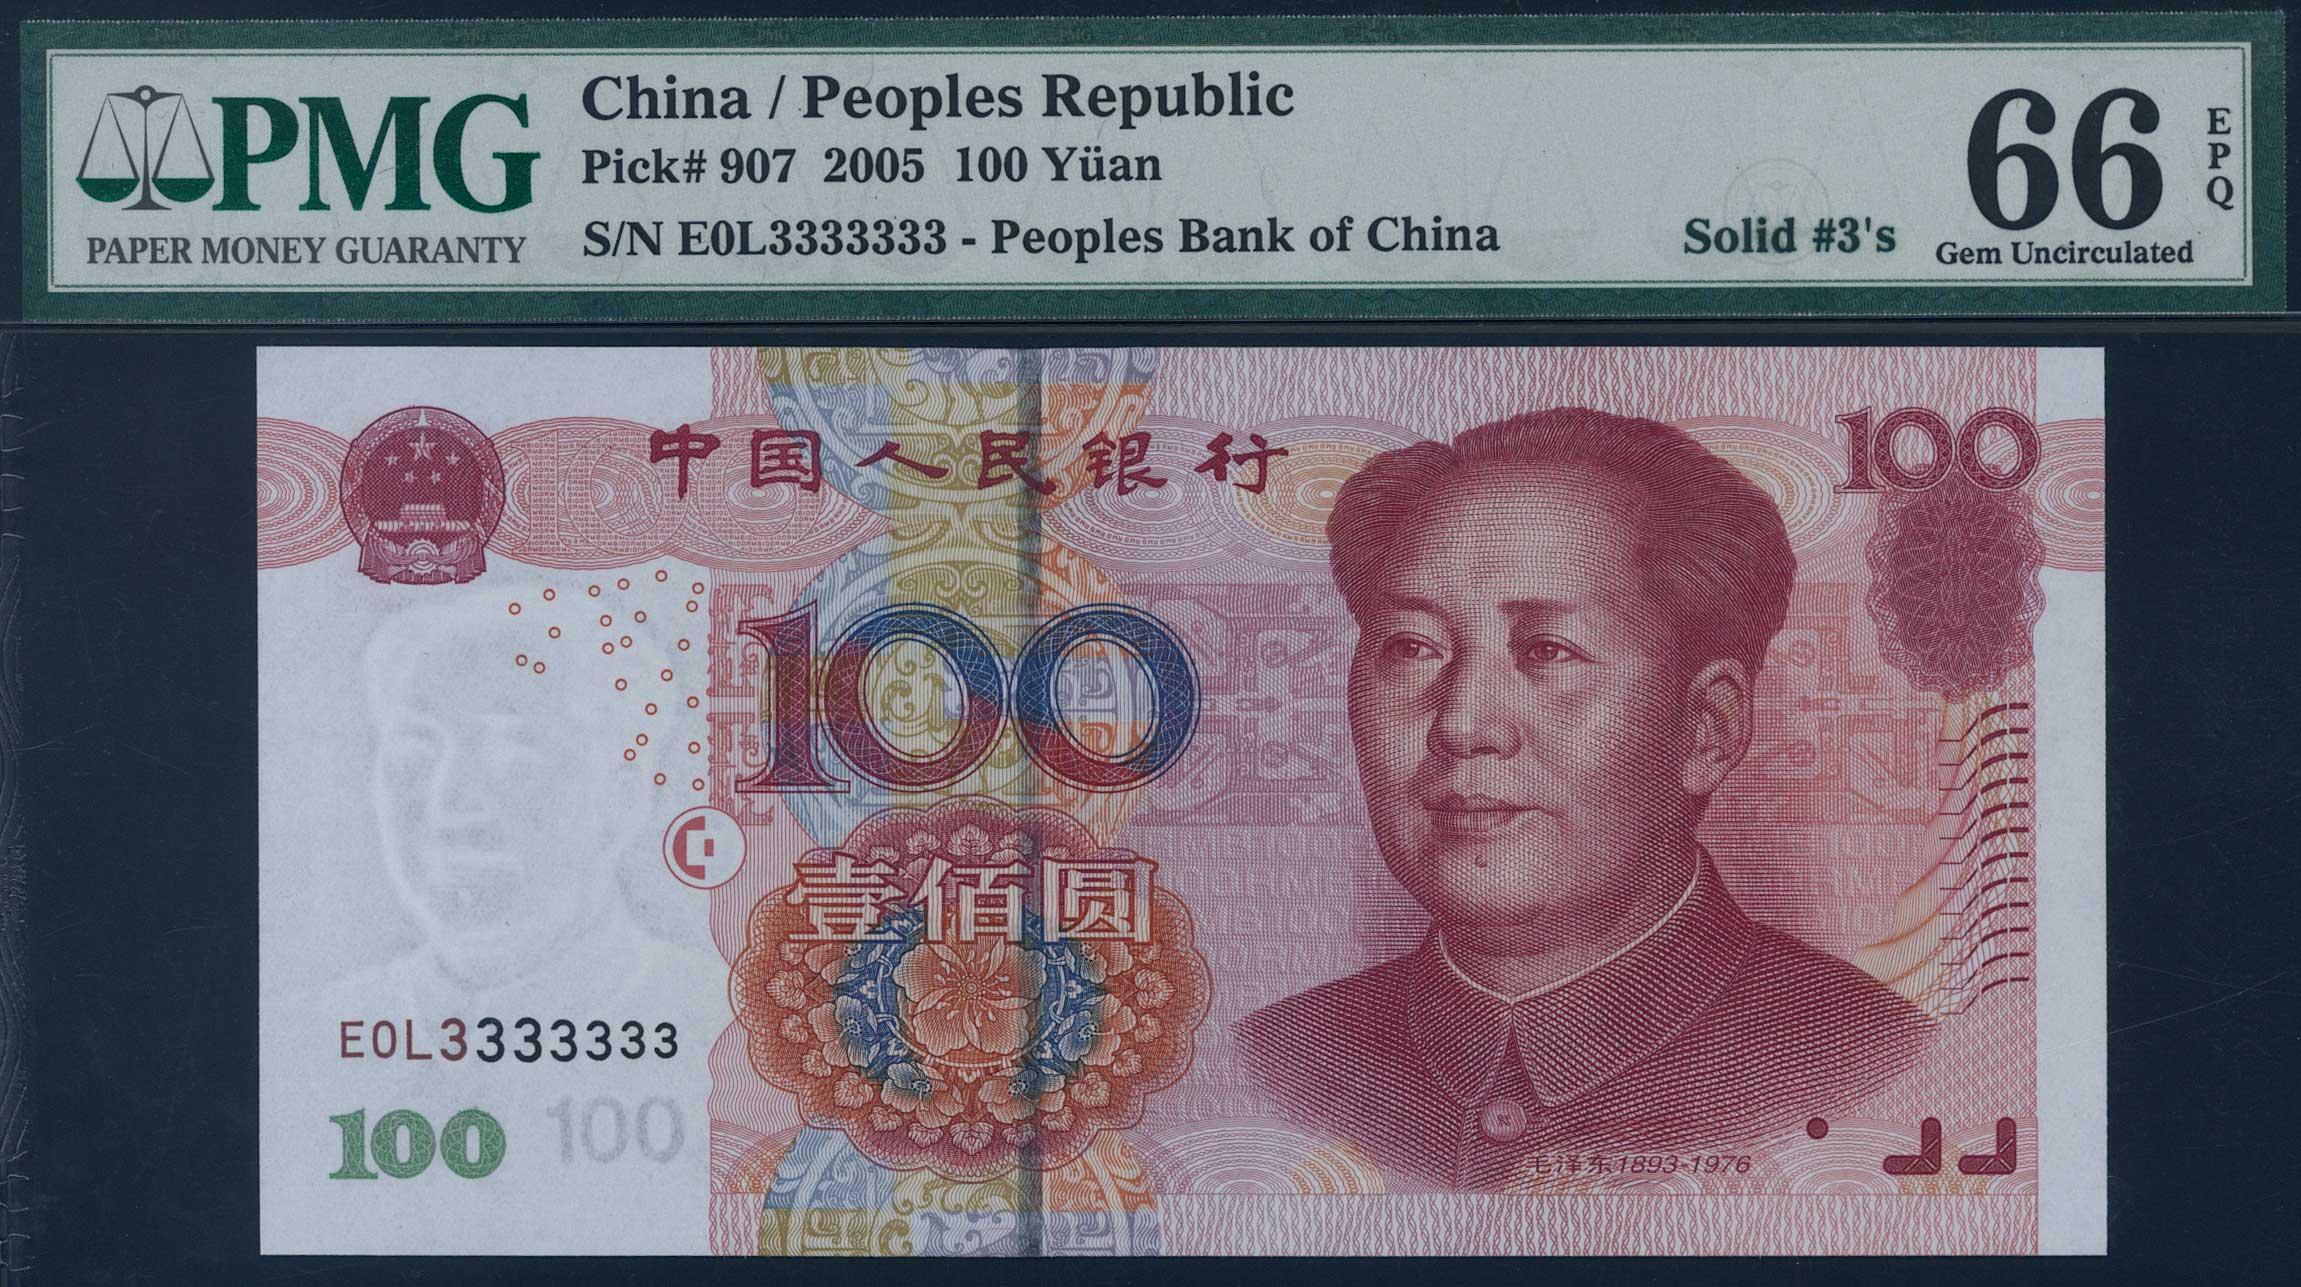 Gem UNC China P-905 2005 20 Yuan